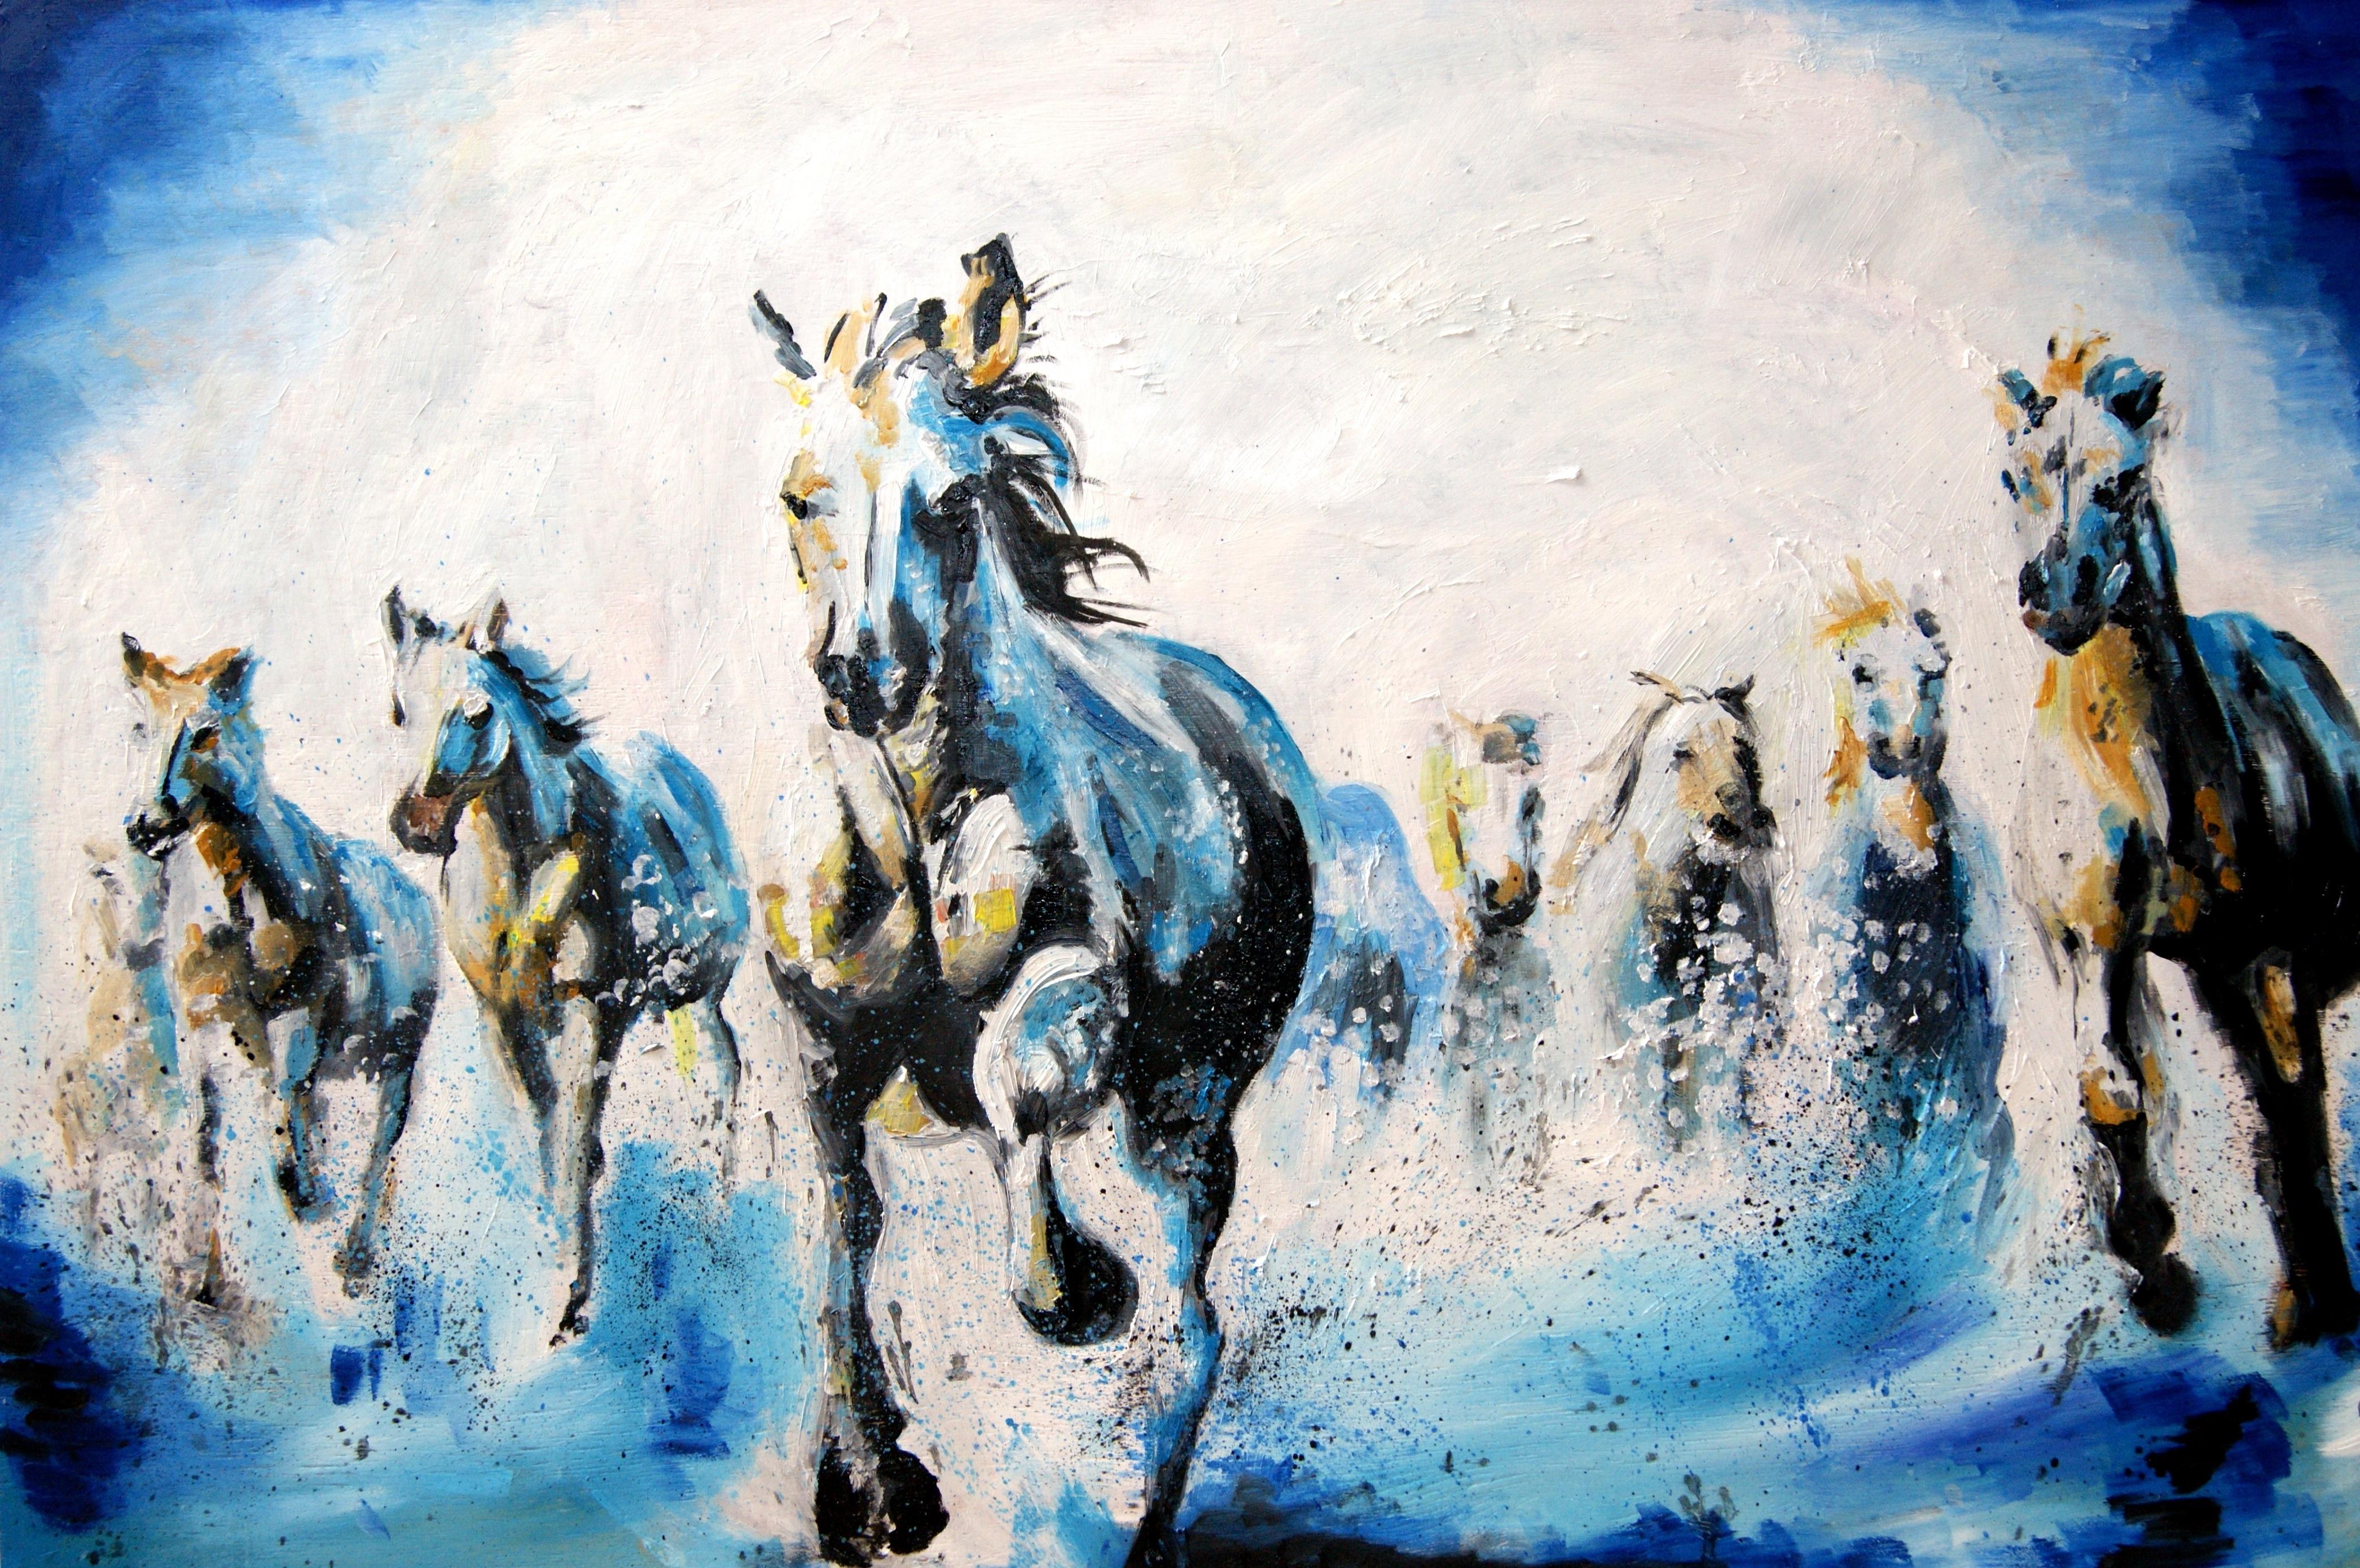 Galloping Horses Oil Painting | Katy Jade Dobson ART